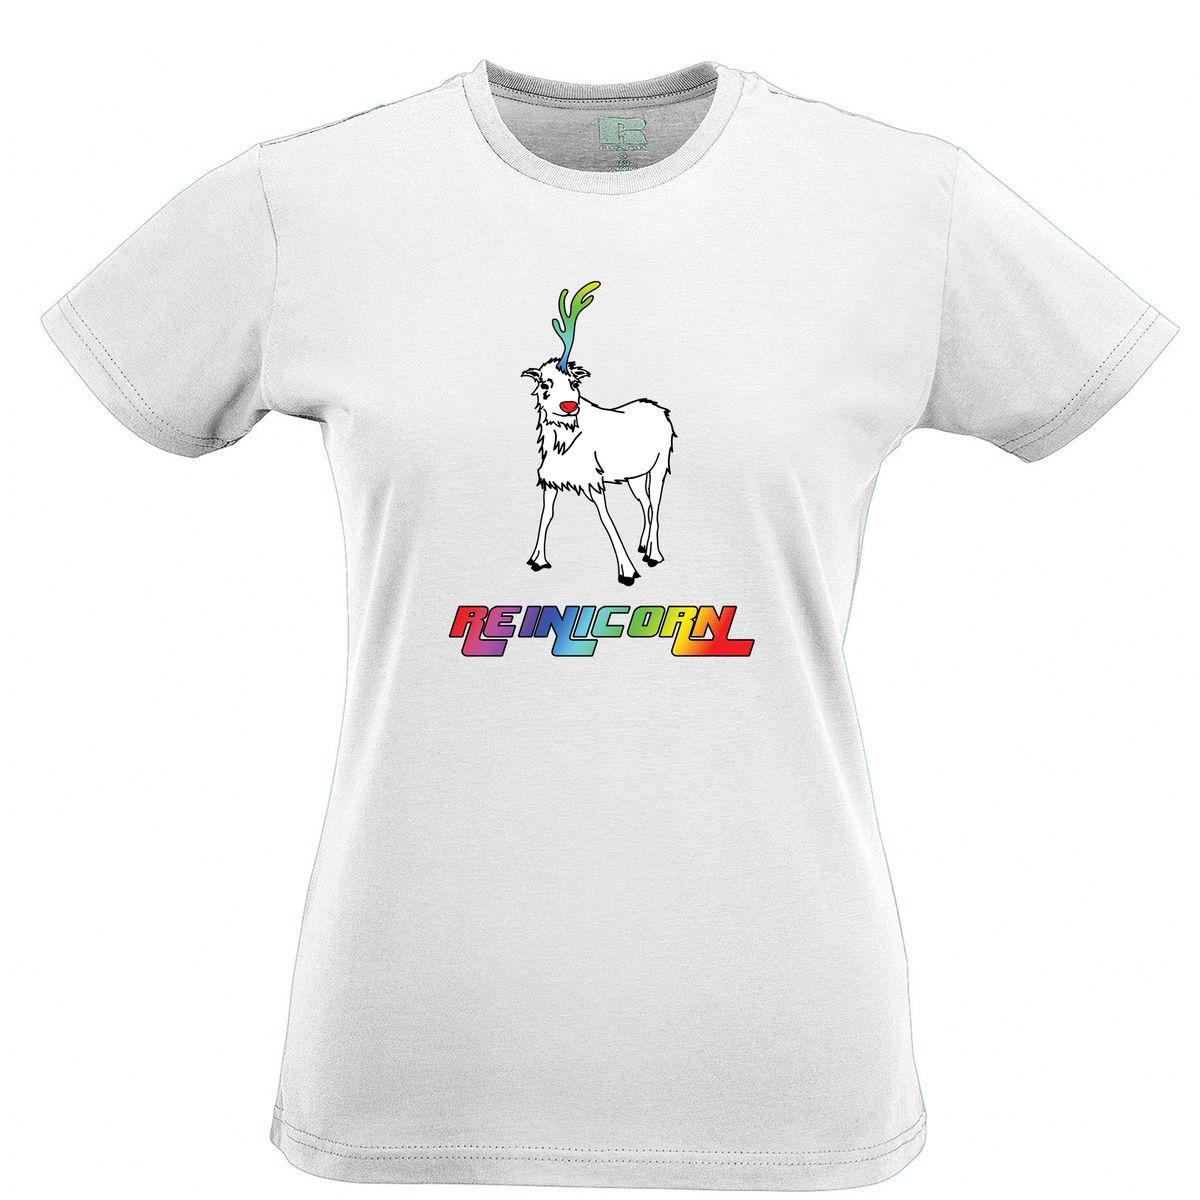 0de2ae5e3d Reinicorn Reindeer Rainbow Unicorn Printed Slogan Quote Design Womens  T-Shirt Novelty Cool Tops Men Short Sleeve free shipping